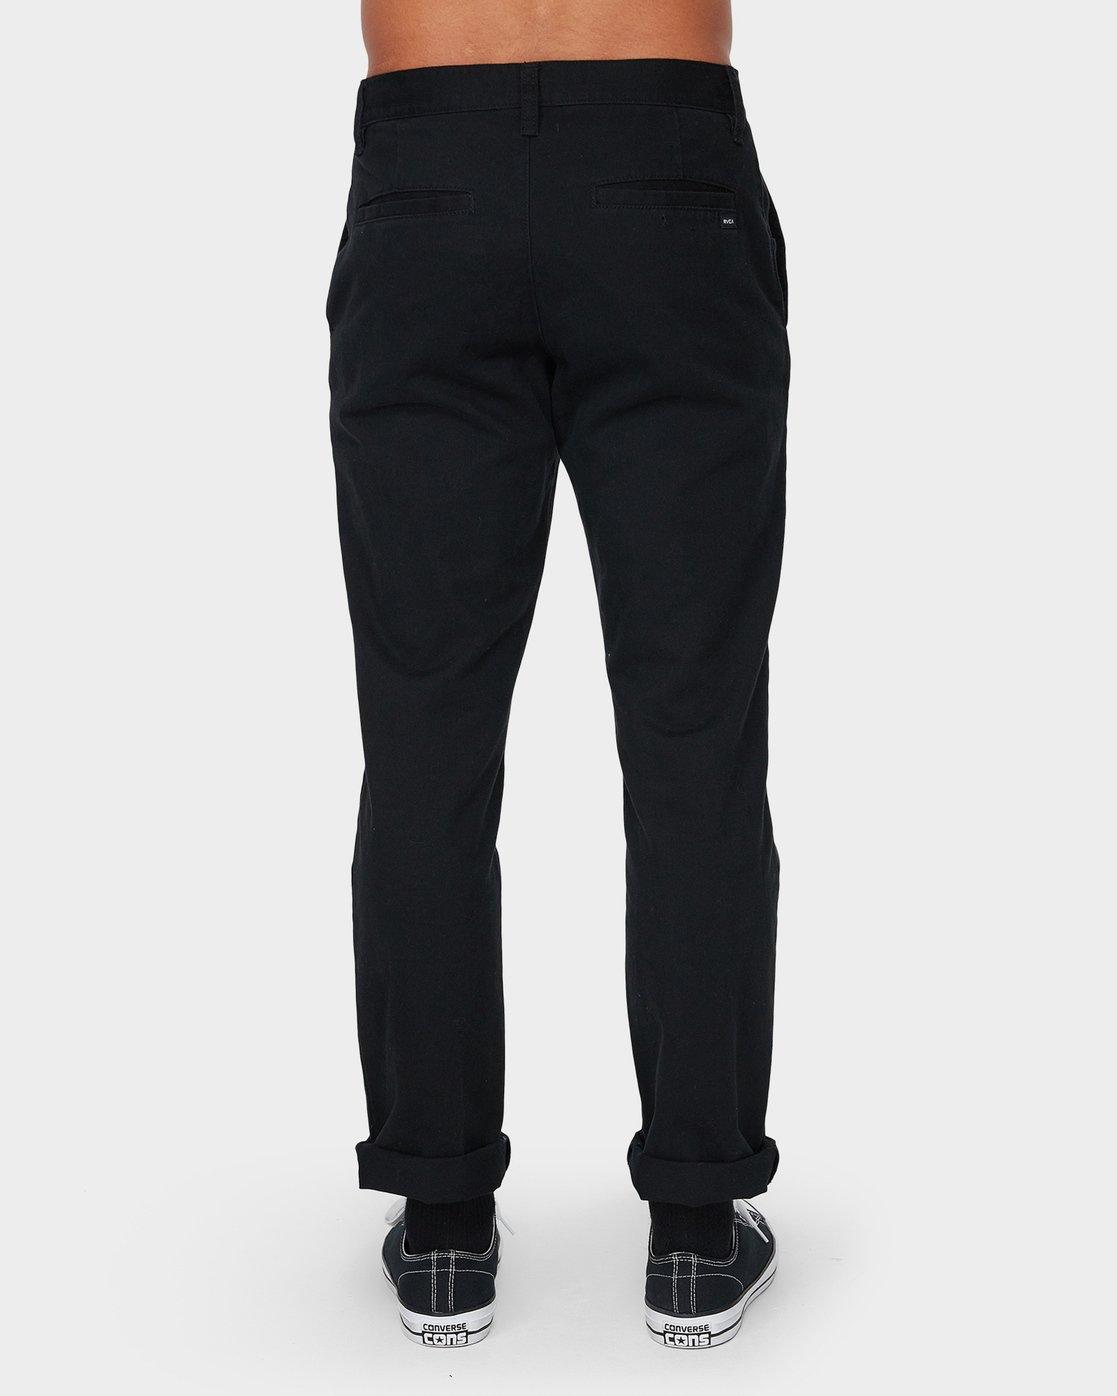 2 Weekday Stretch Pant Black R593271 RVCA